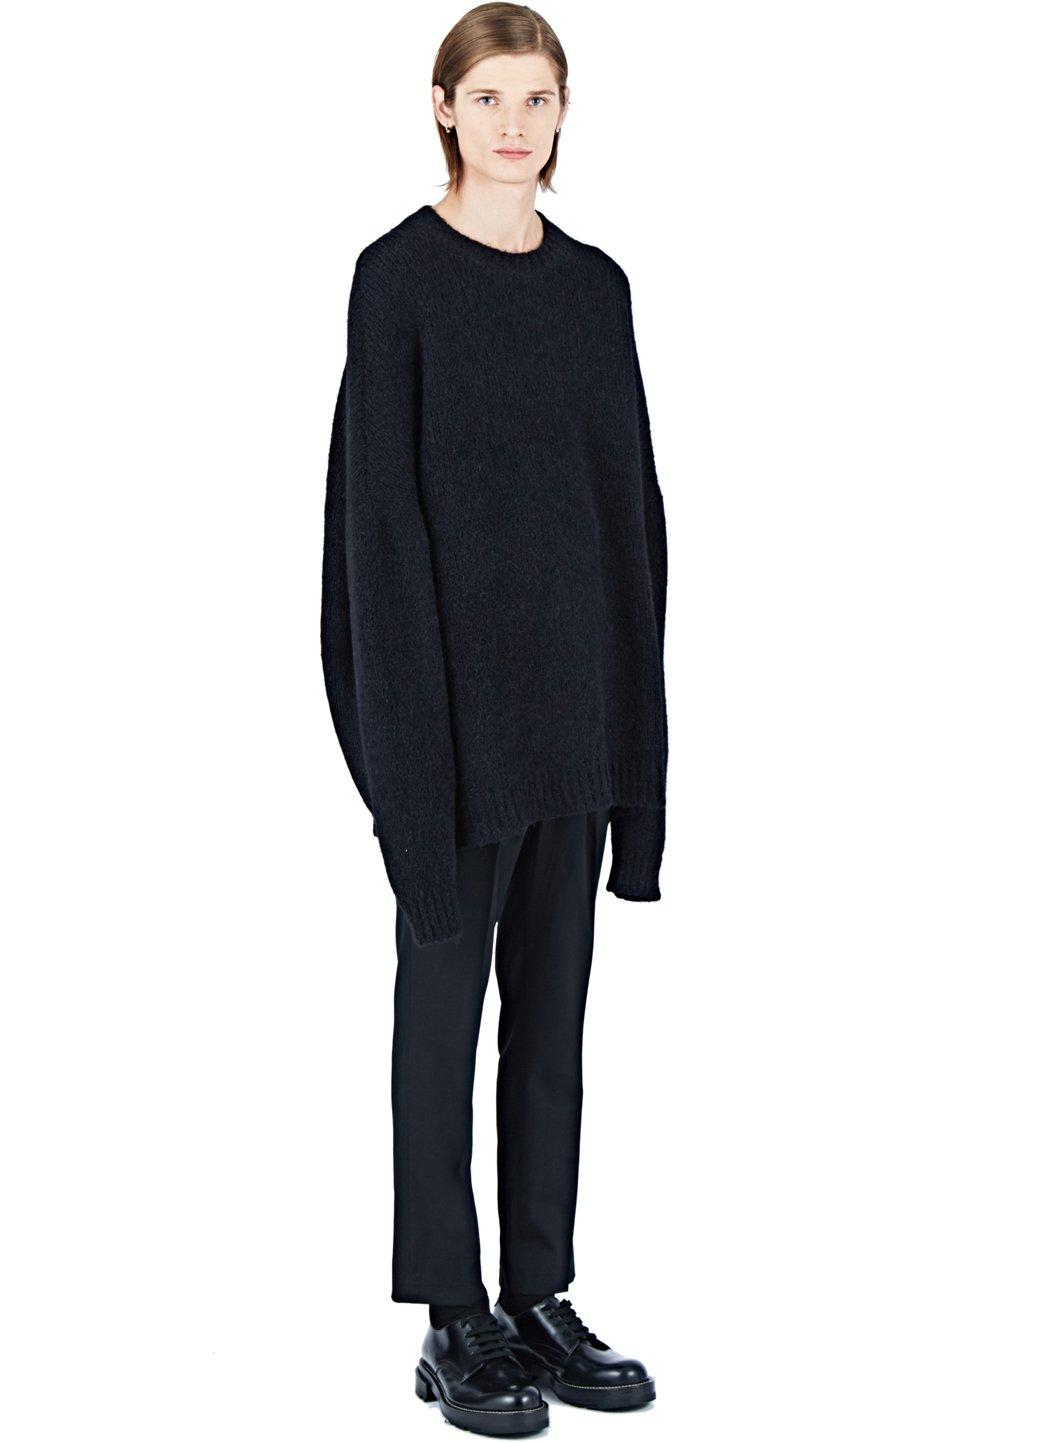 Thamanyah Oversized Crew Neck Sweater In Black For Men Lyst